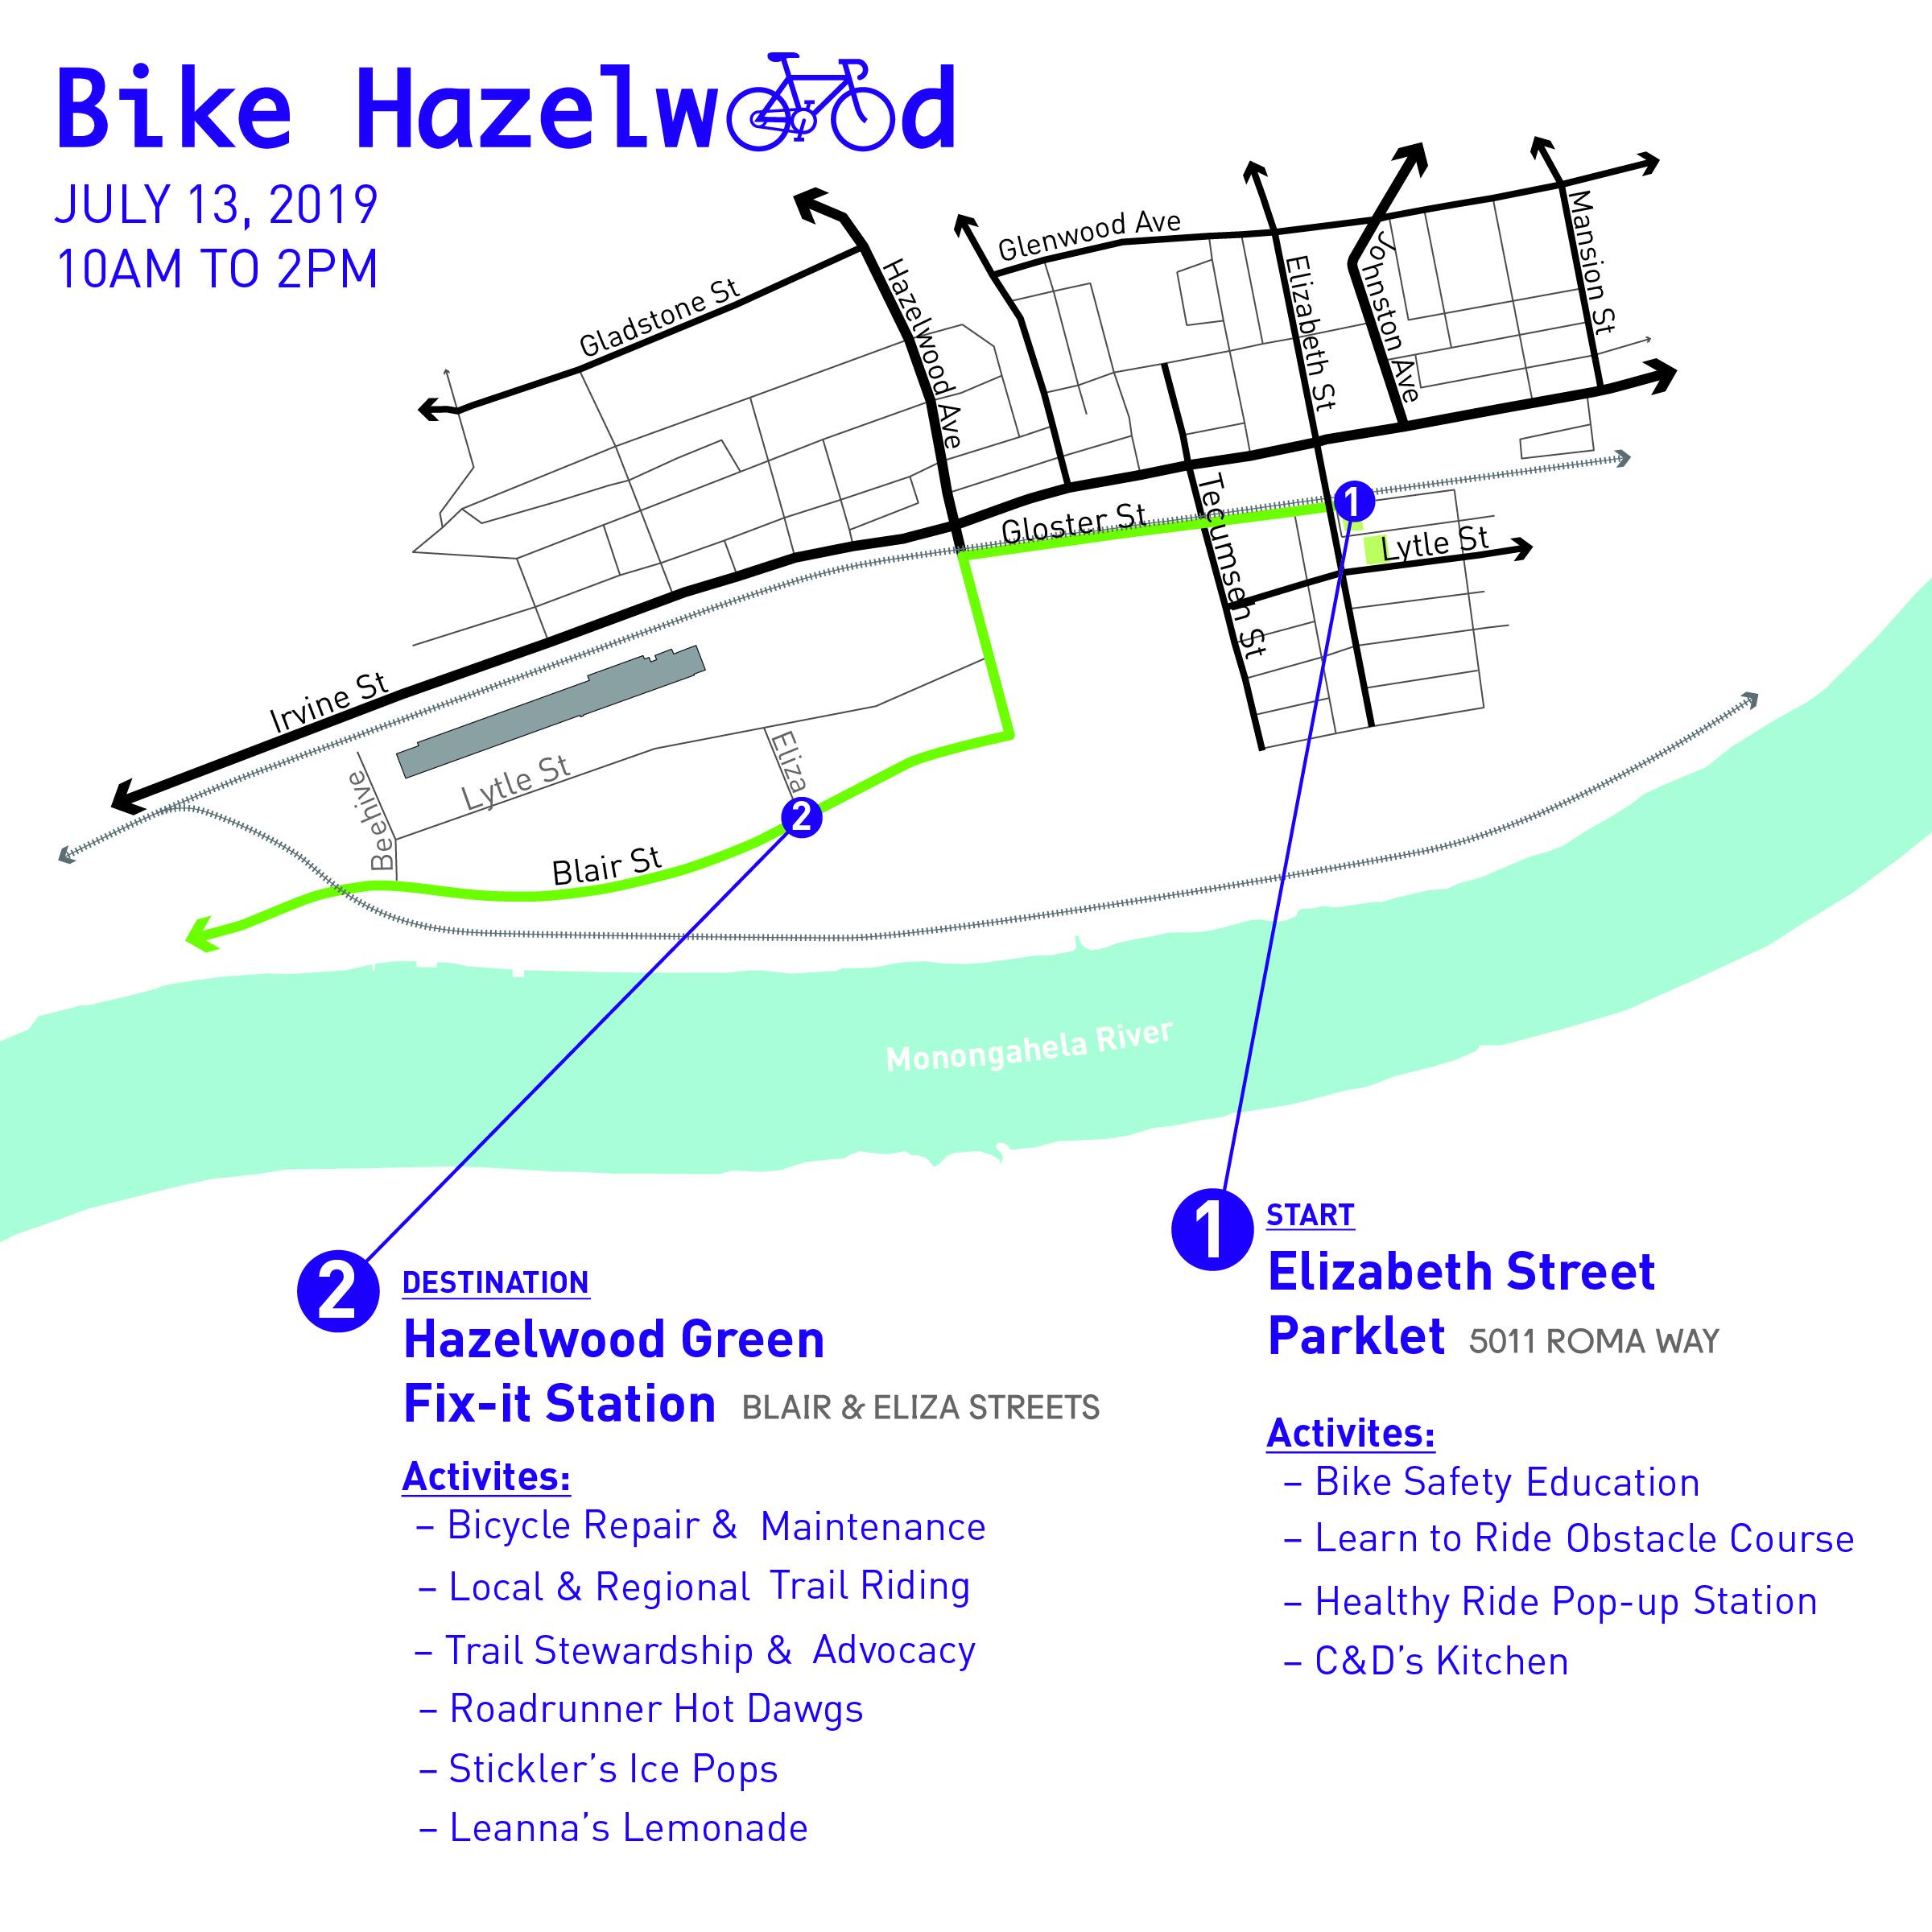 Bike_Hazelwood_Map_v2-01.jpg